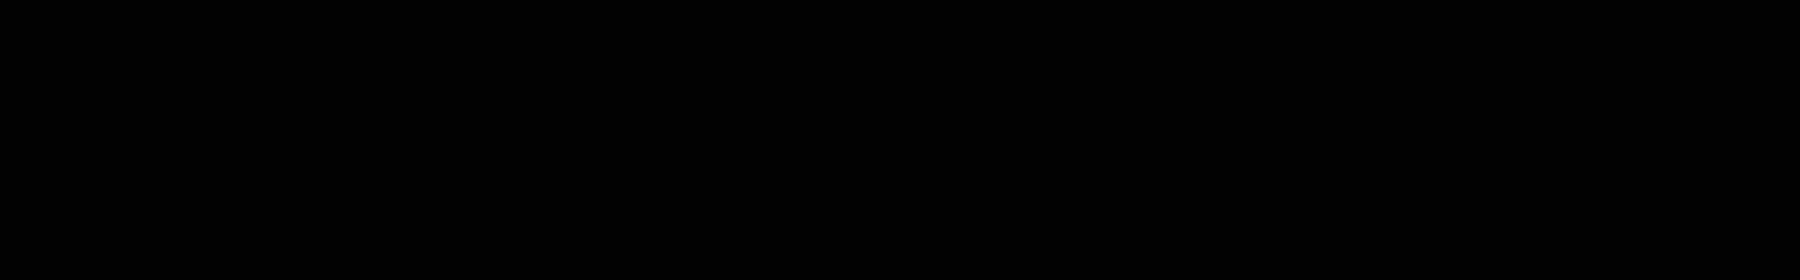 Serum Bass audio waveform